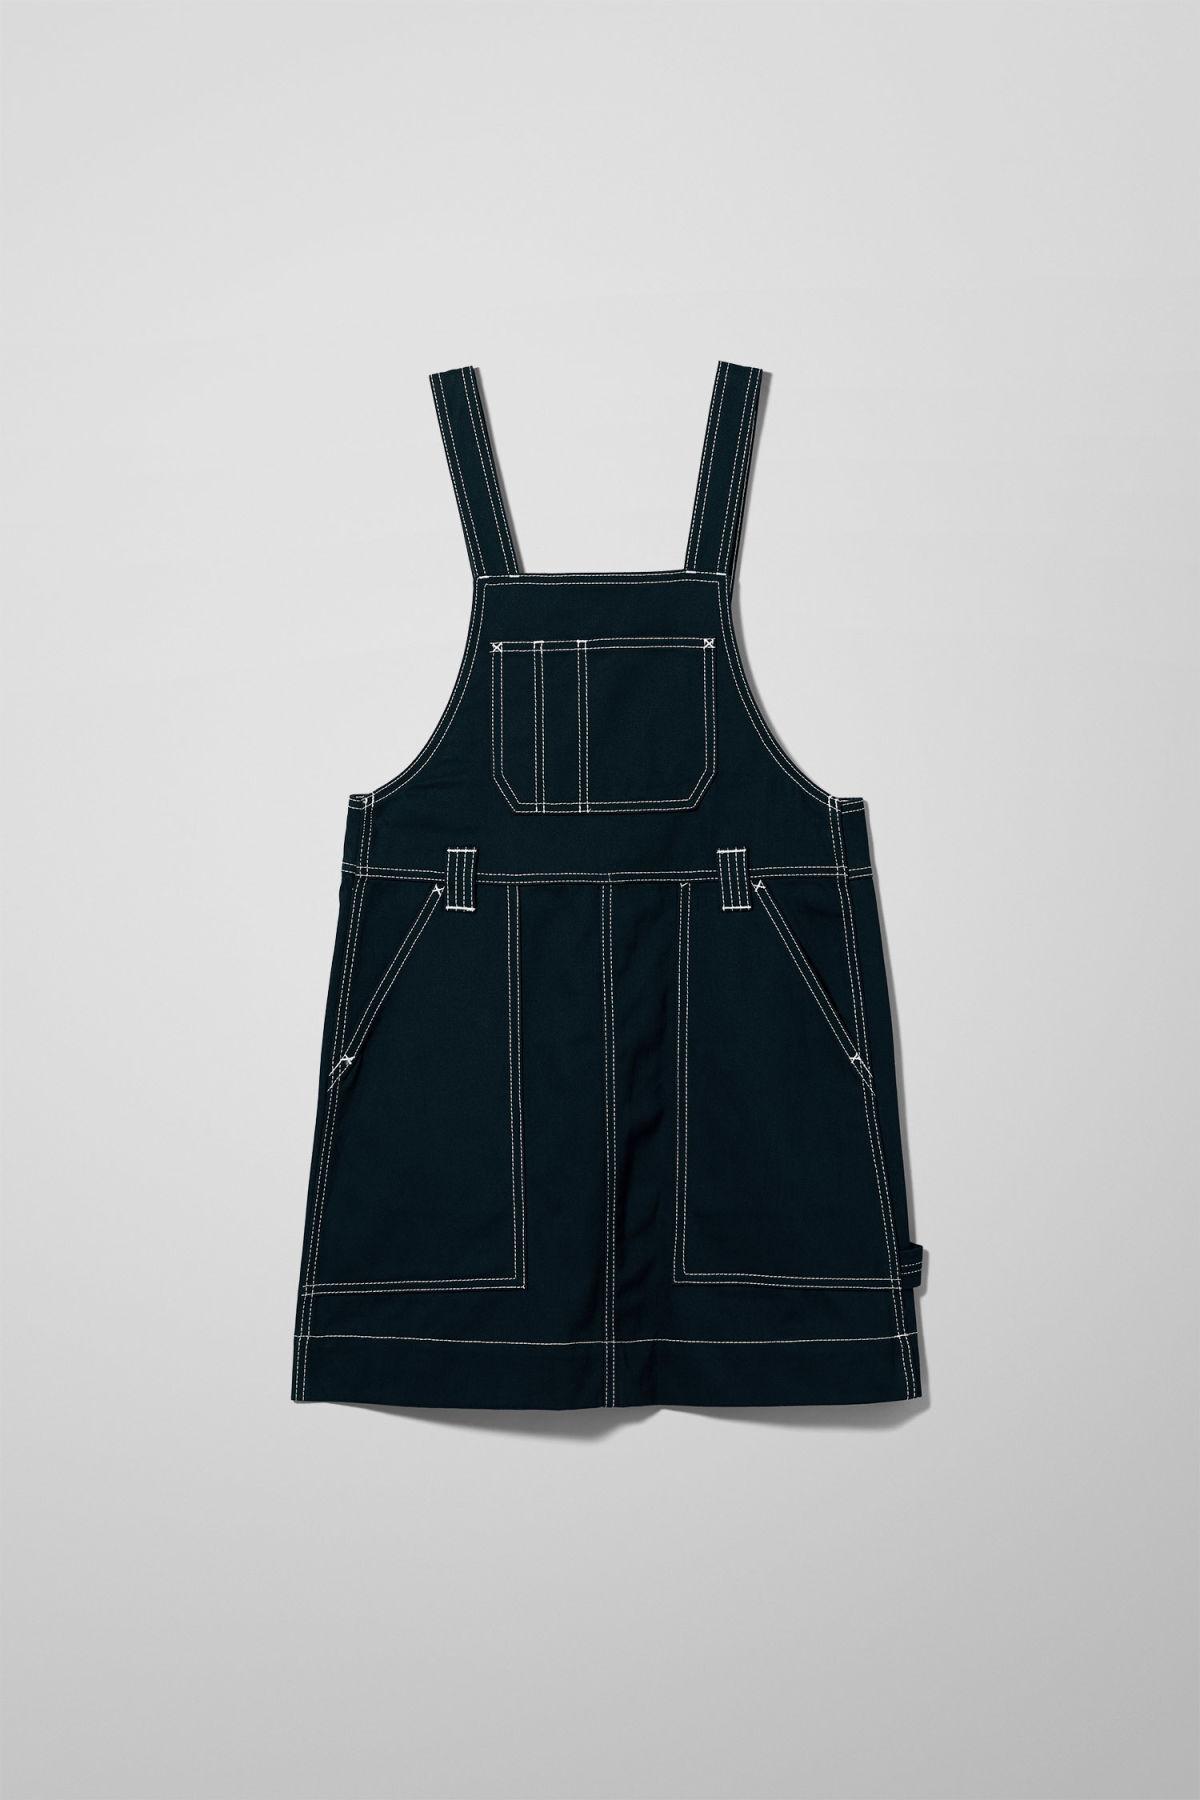 Image of Grow Workwear Dress - Black-34